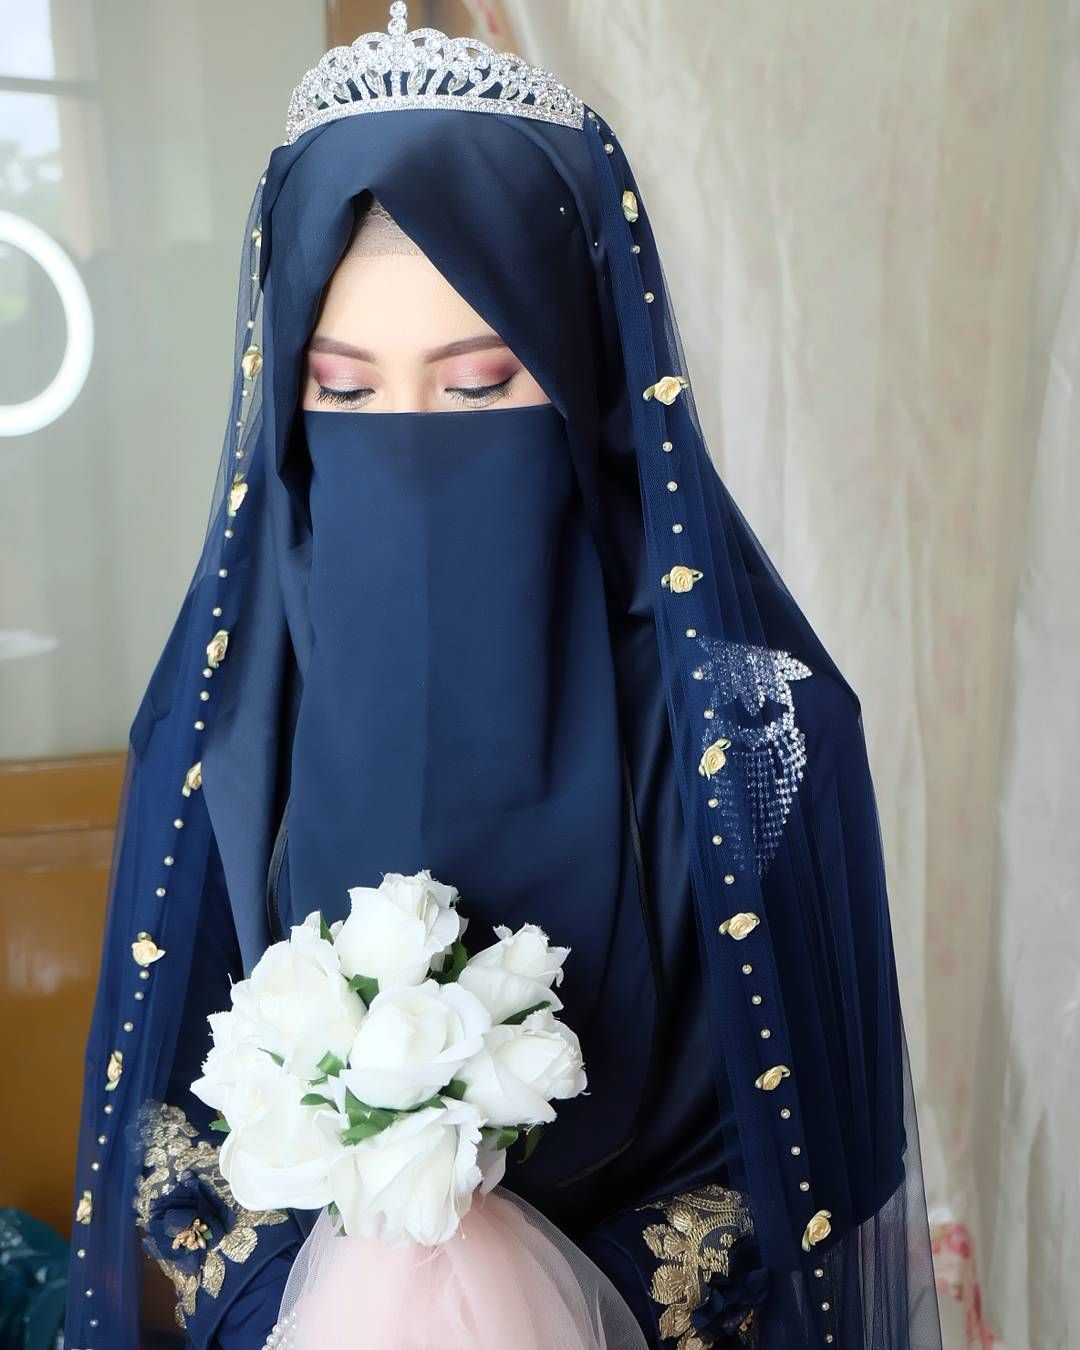 Resepsi Teh Shannaz Makeup And Hijab Syar I As Requested A Very Natural Eyebrow Wihtout Browtrimming An Bridal Hijab Styles Muslimah Wedding Dress Hijab Bride